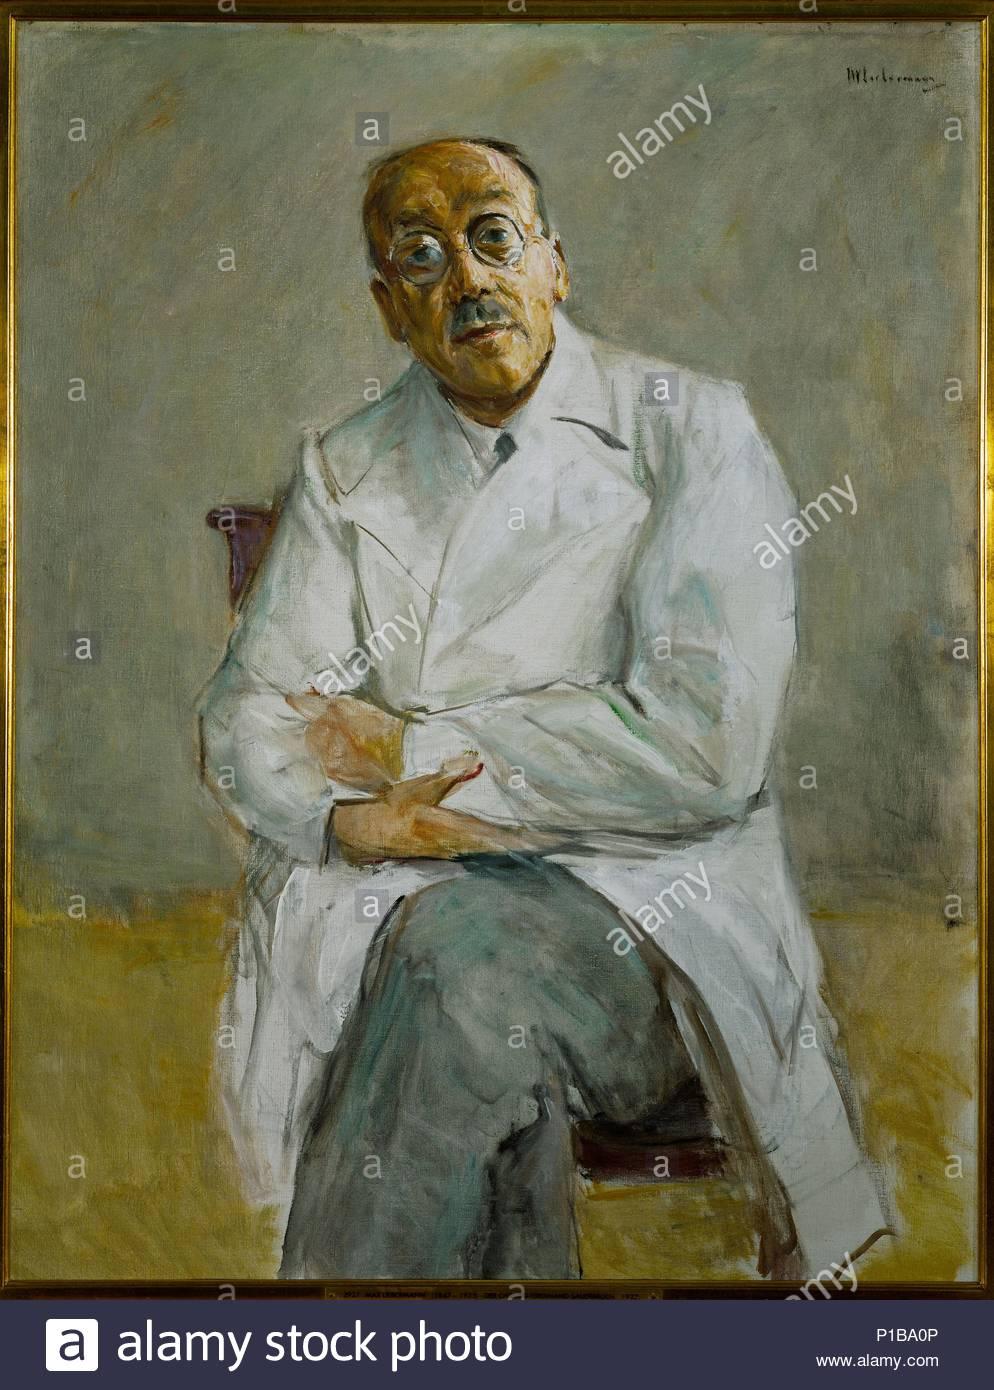 Portrait of surgeon Professor Ferdinand Sauerbruch, (1875-1951). Canvas, 117,2 x 89,4 cm Inv.2927. Author: Max Liebermann (1847-1935). Location: Kunsthalle, Hamburg, Germany. - Stock Image